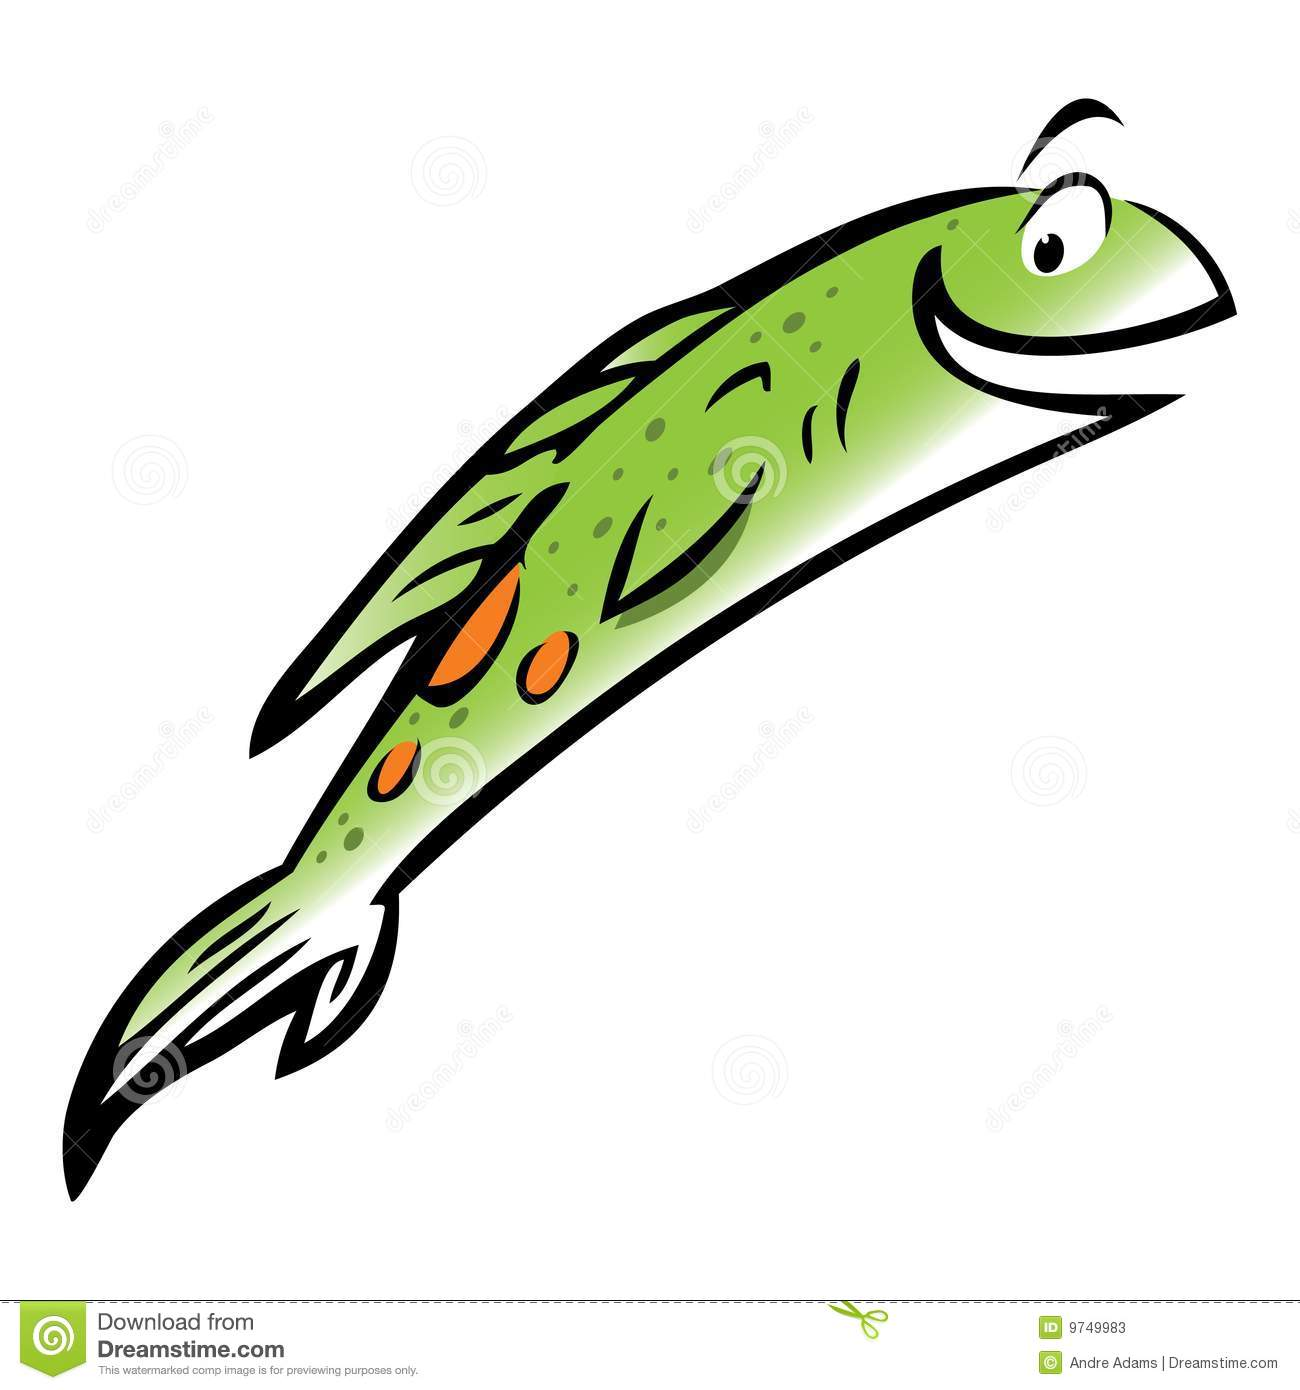 Jumping fish cartoon.